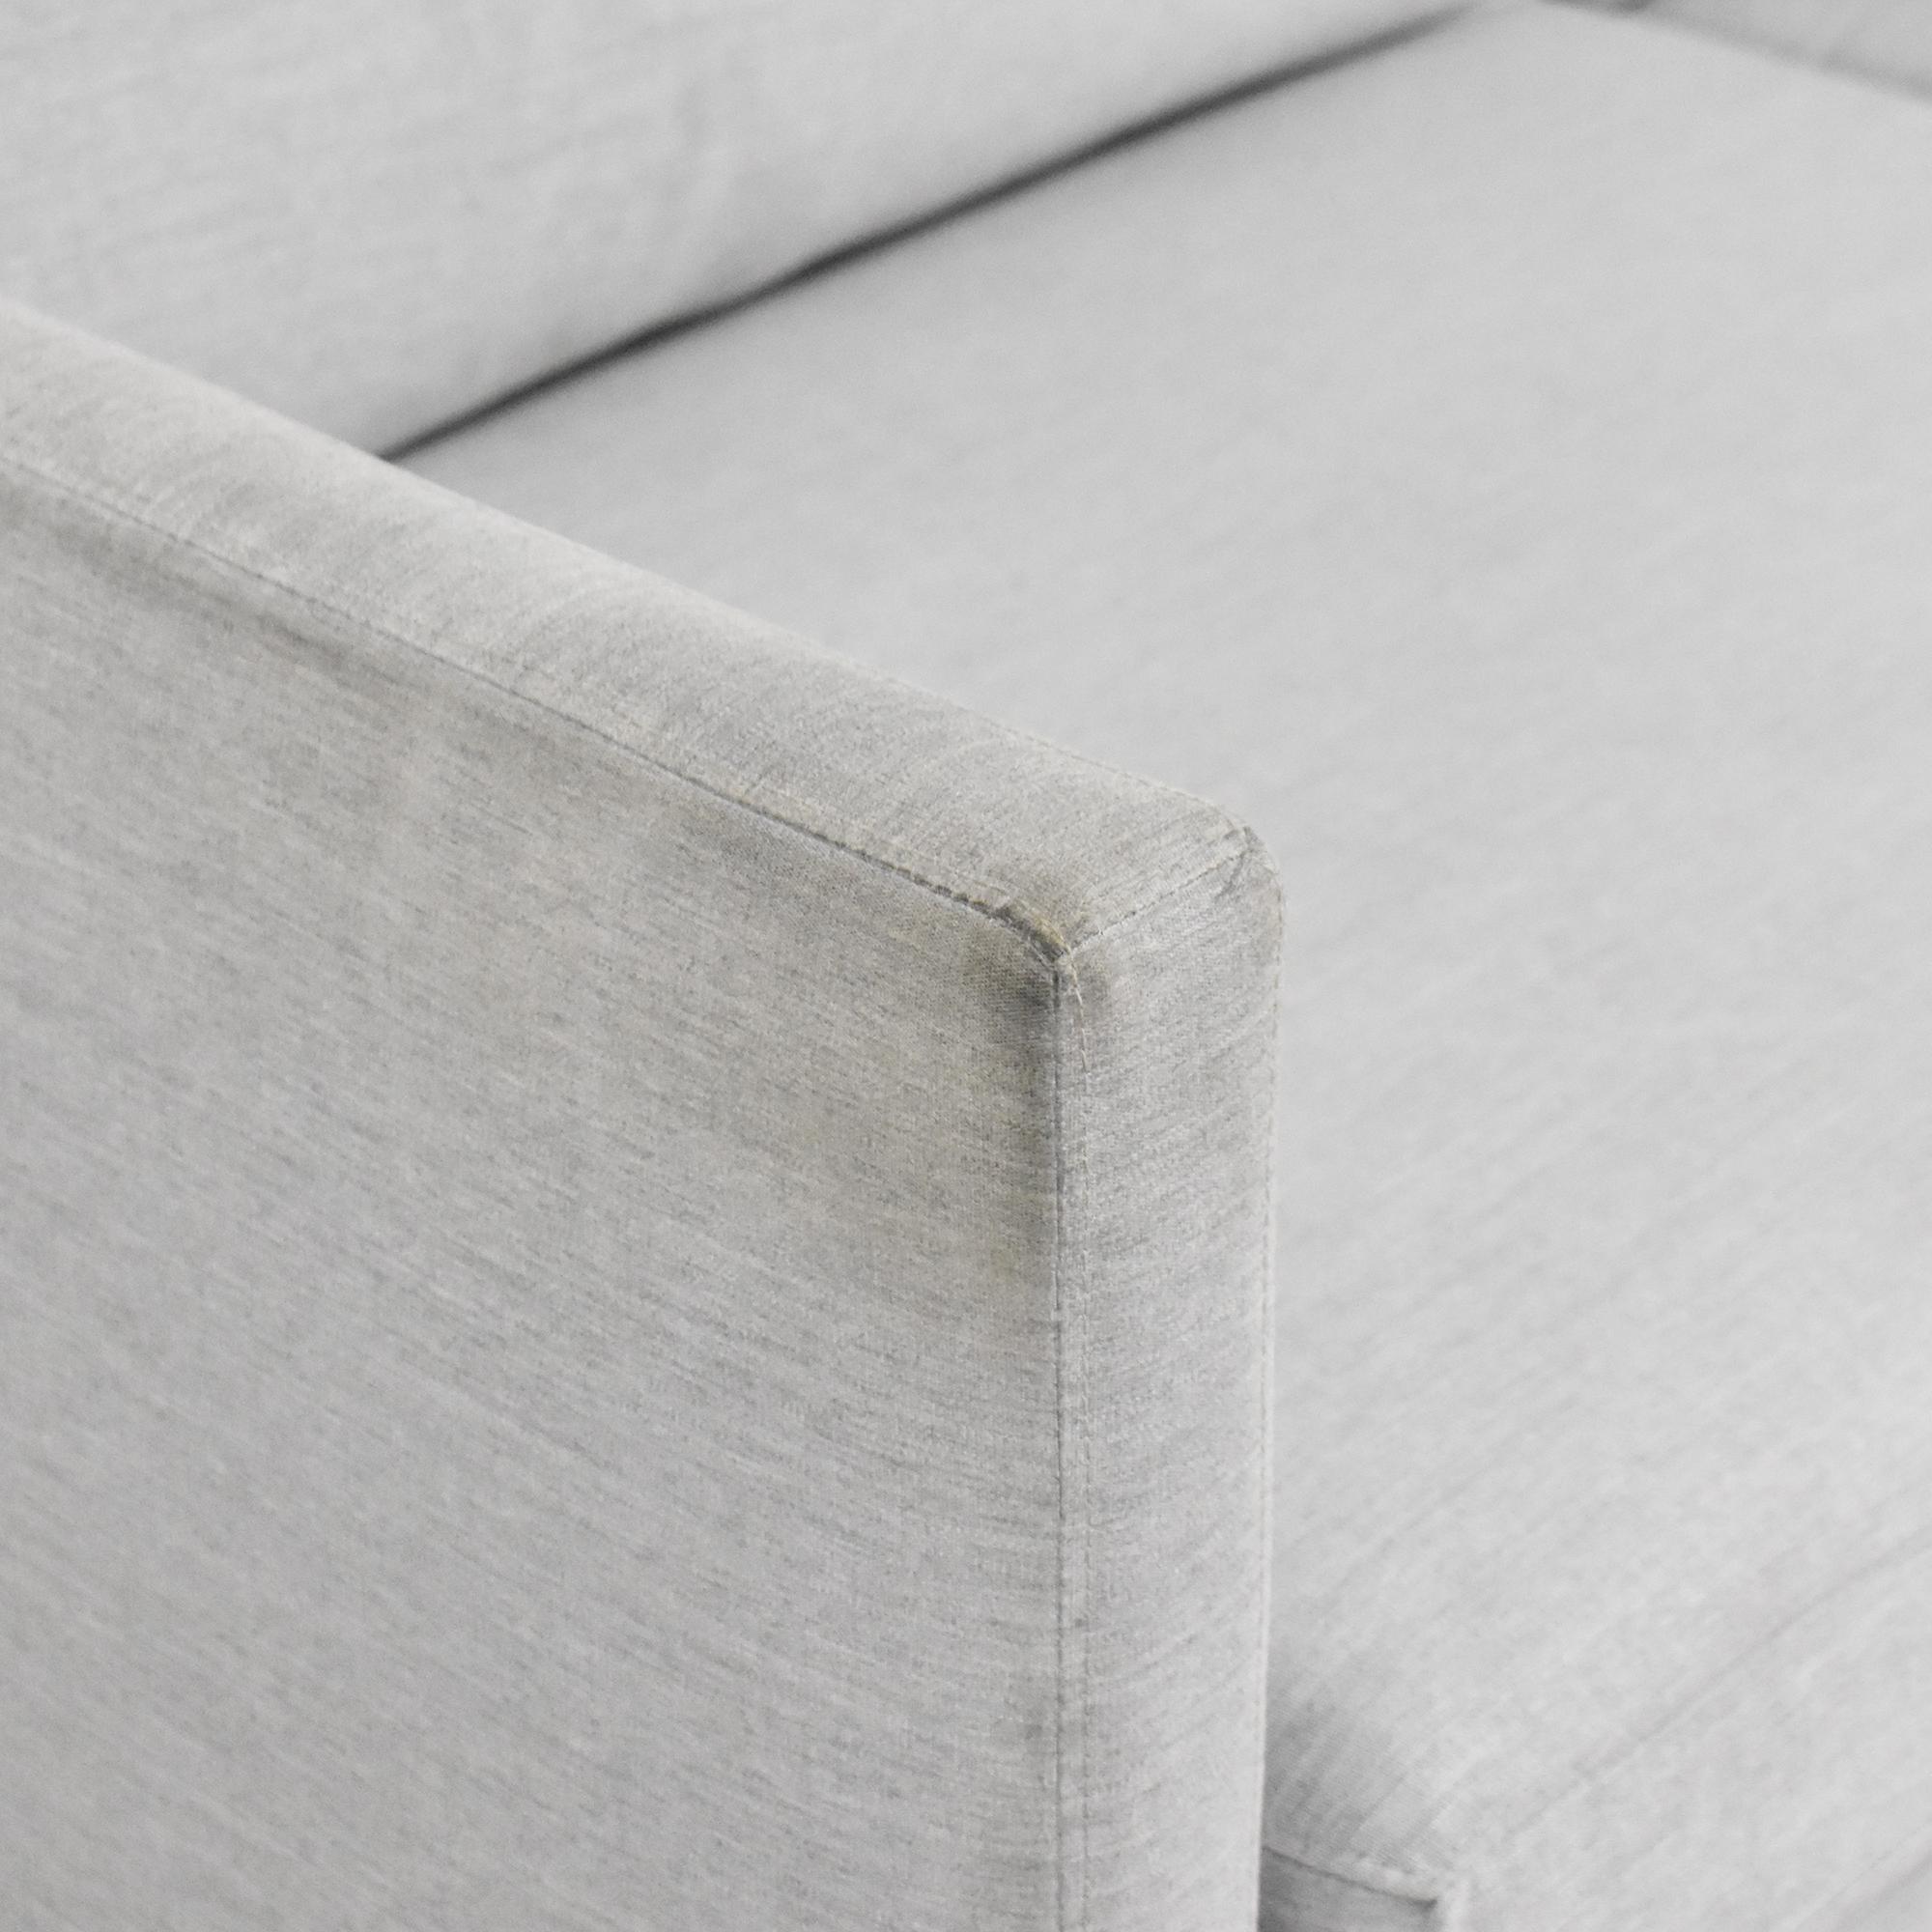 ABC Carpet & Home ABC Carpet & Home Two Cushion Sofa price